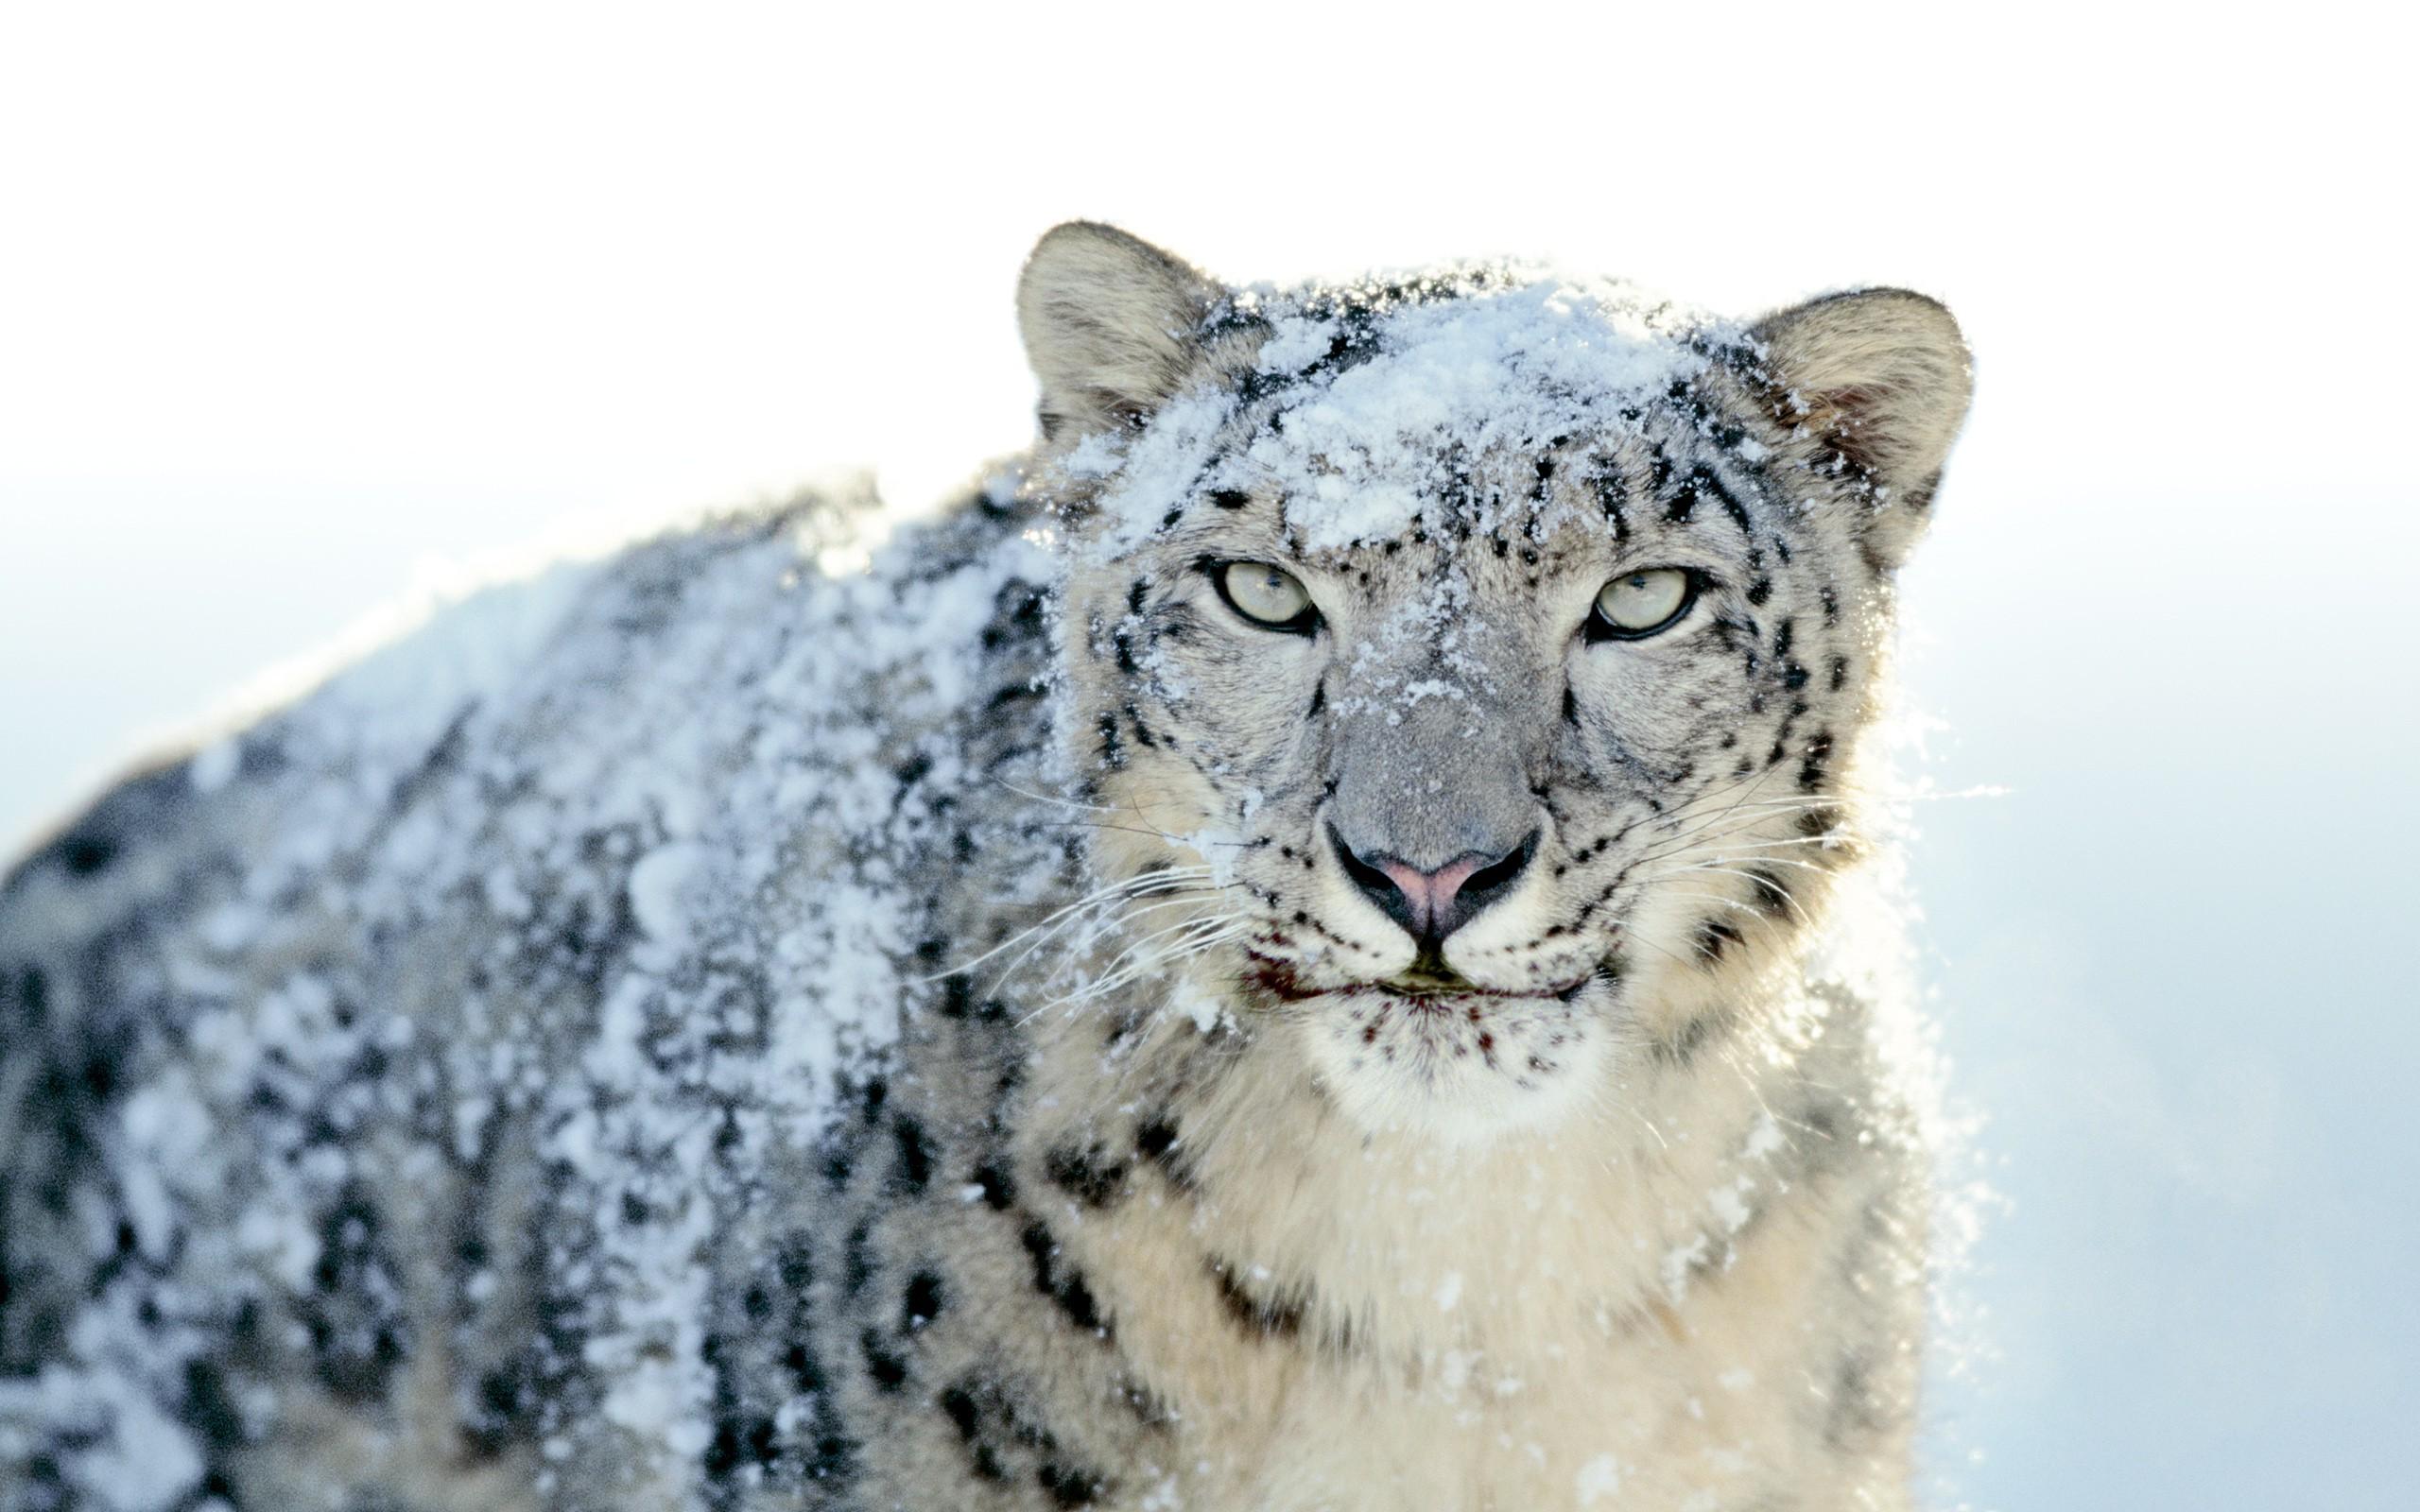 Mac Wallpaper Snow Leopard (64+ images)